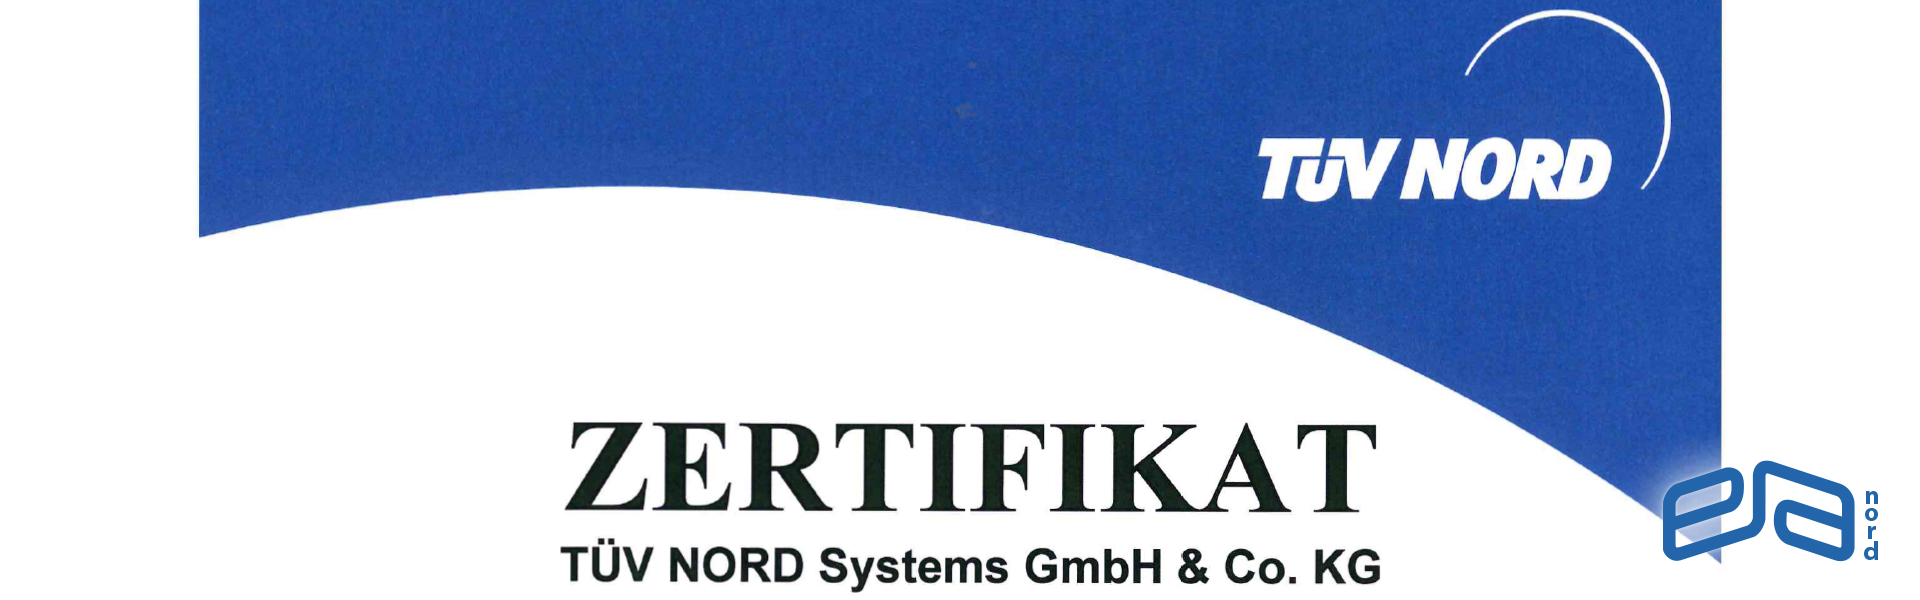 ea-nord-zertifikate-02